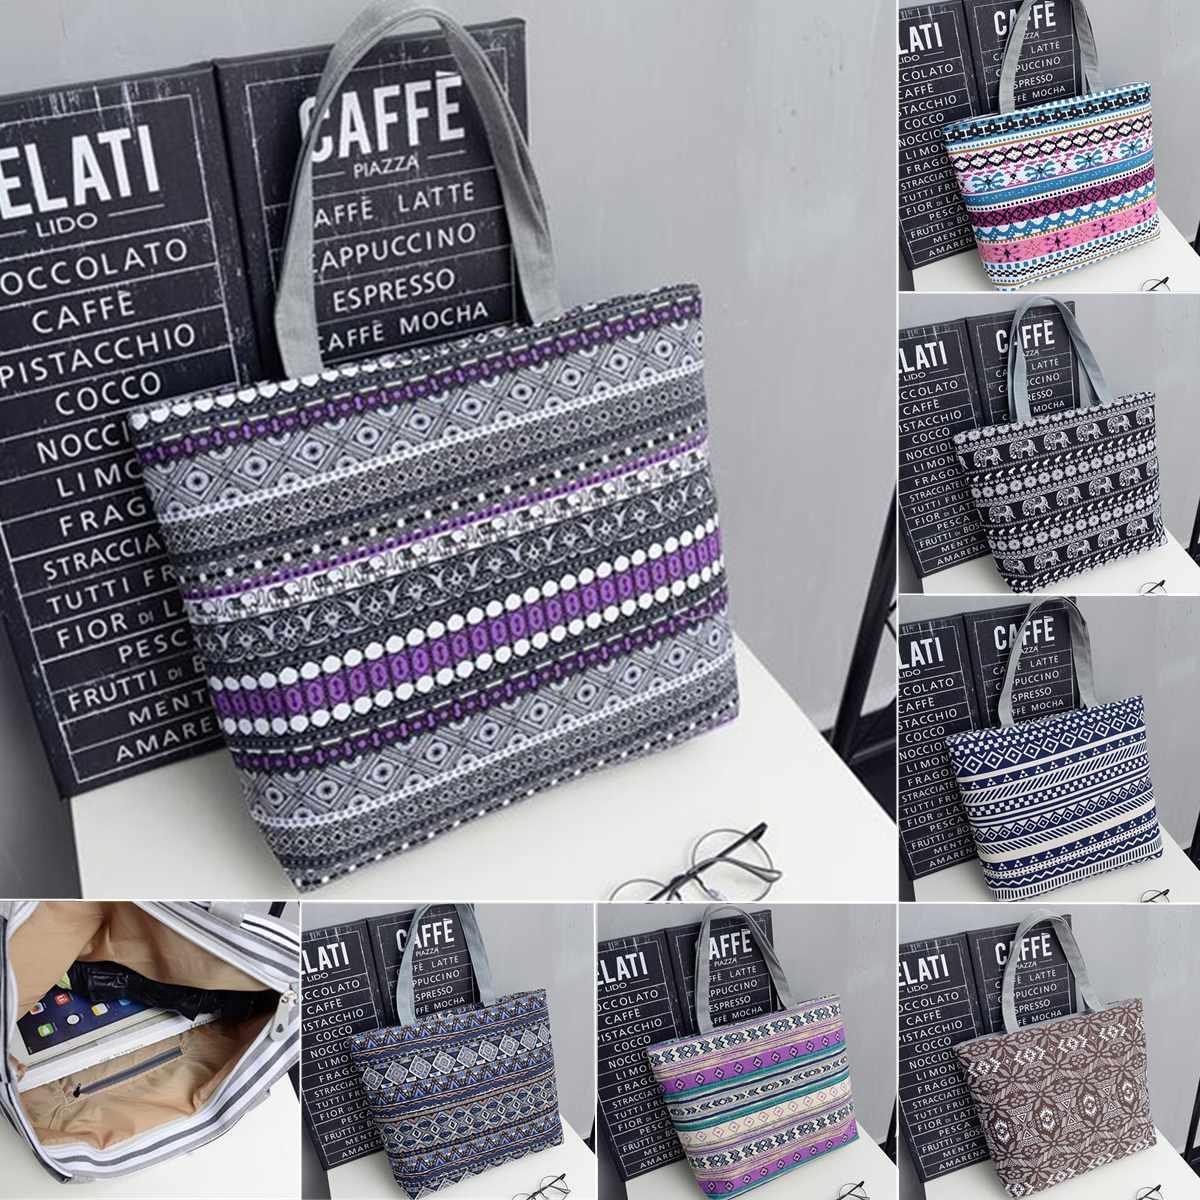 2019 Feminina Bolsa Women Large Capacity Tote Canvas Shoulder Bags Shopping Bag Beach Bags Casual Tote Striped Floral Handbag